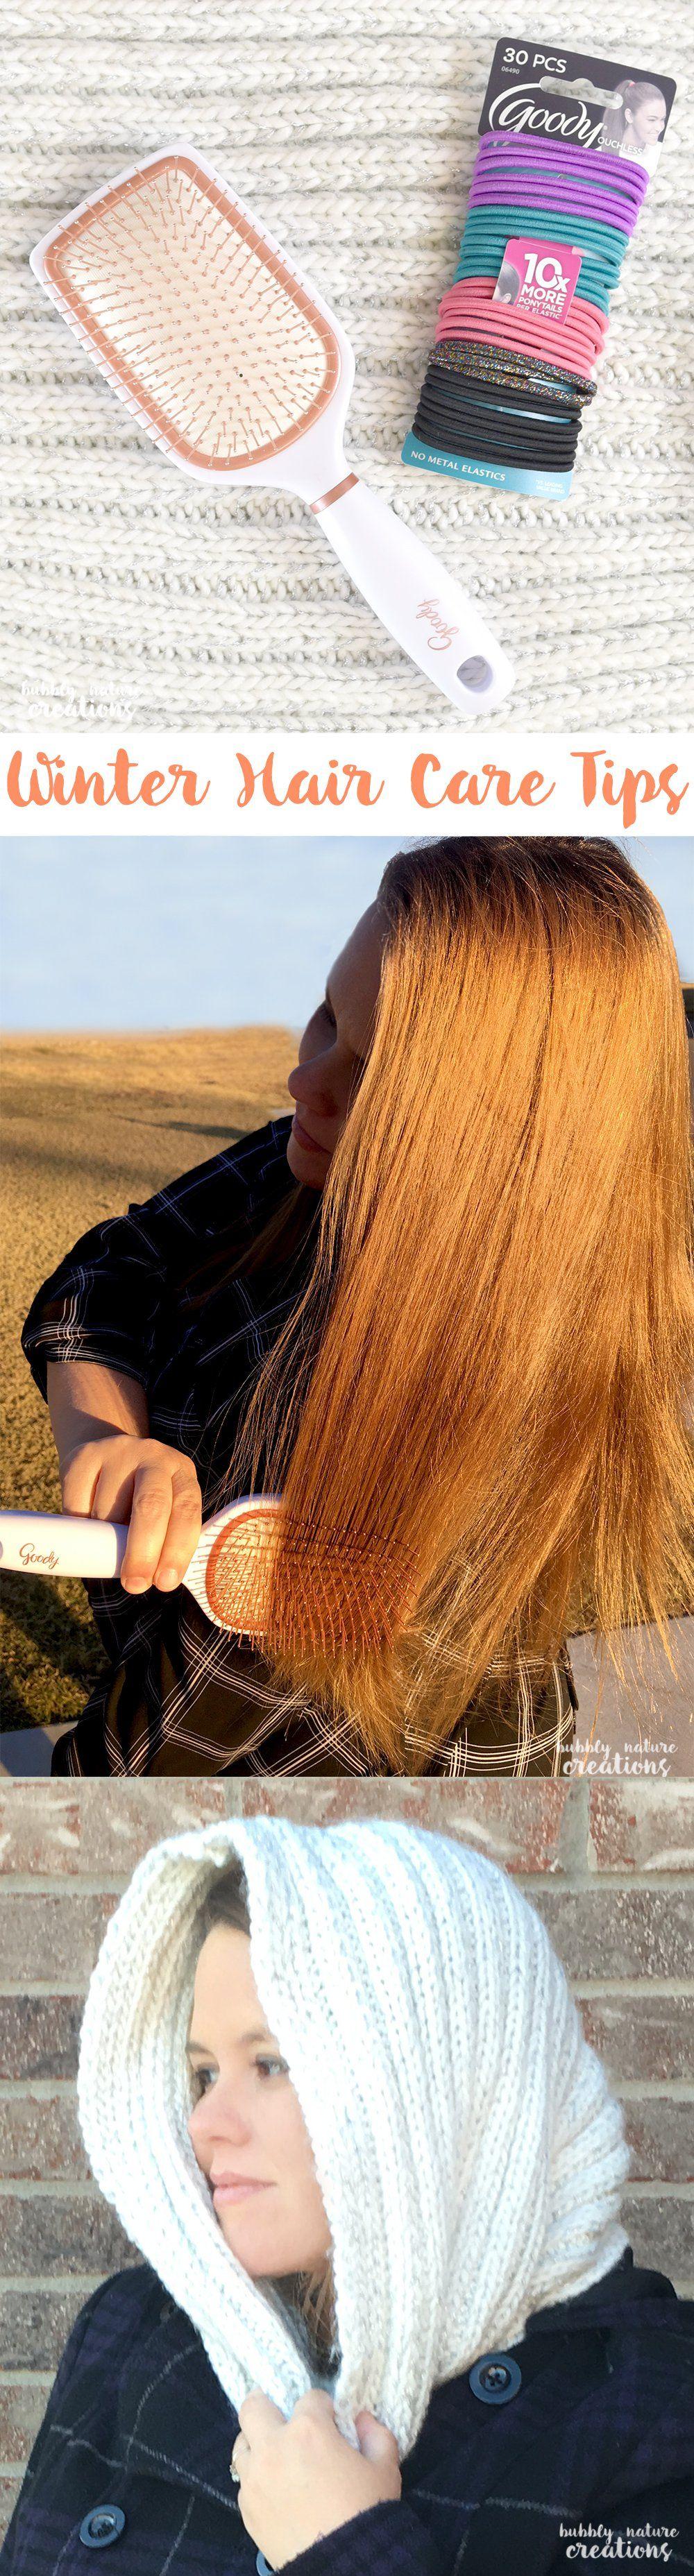 Winter Hair Care Tips Winter hairstyles, Hair care, Hair